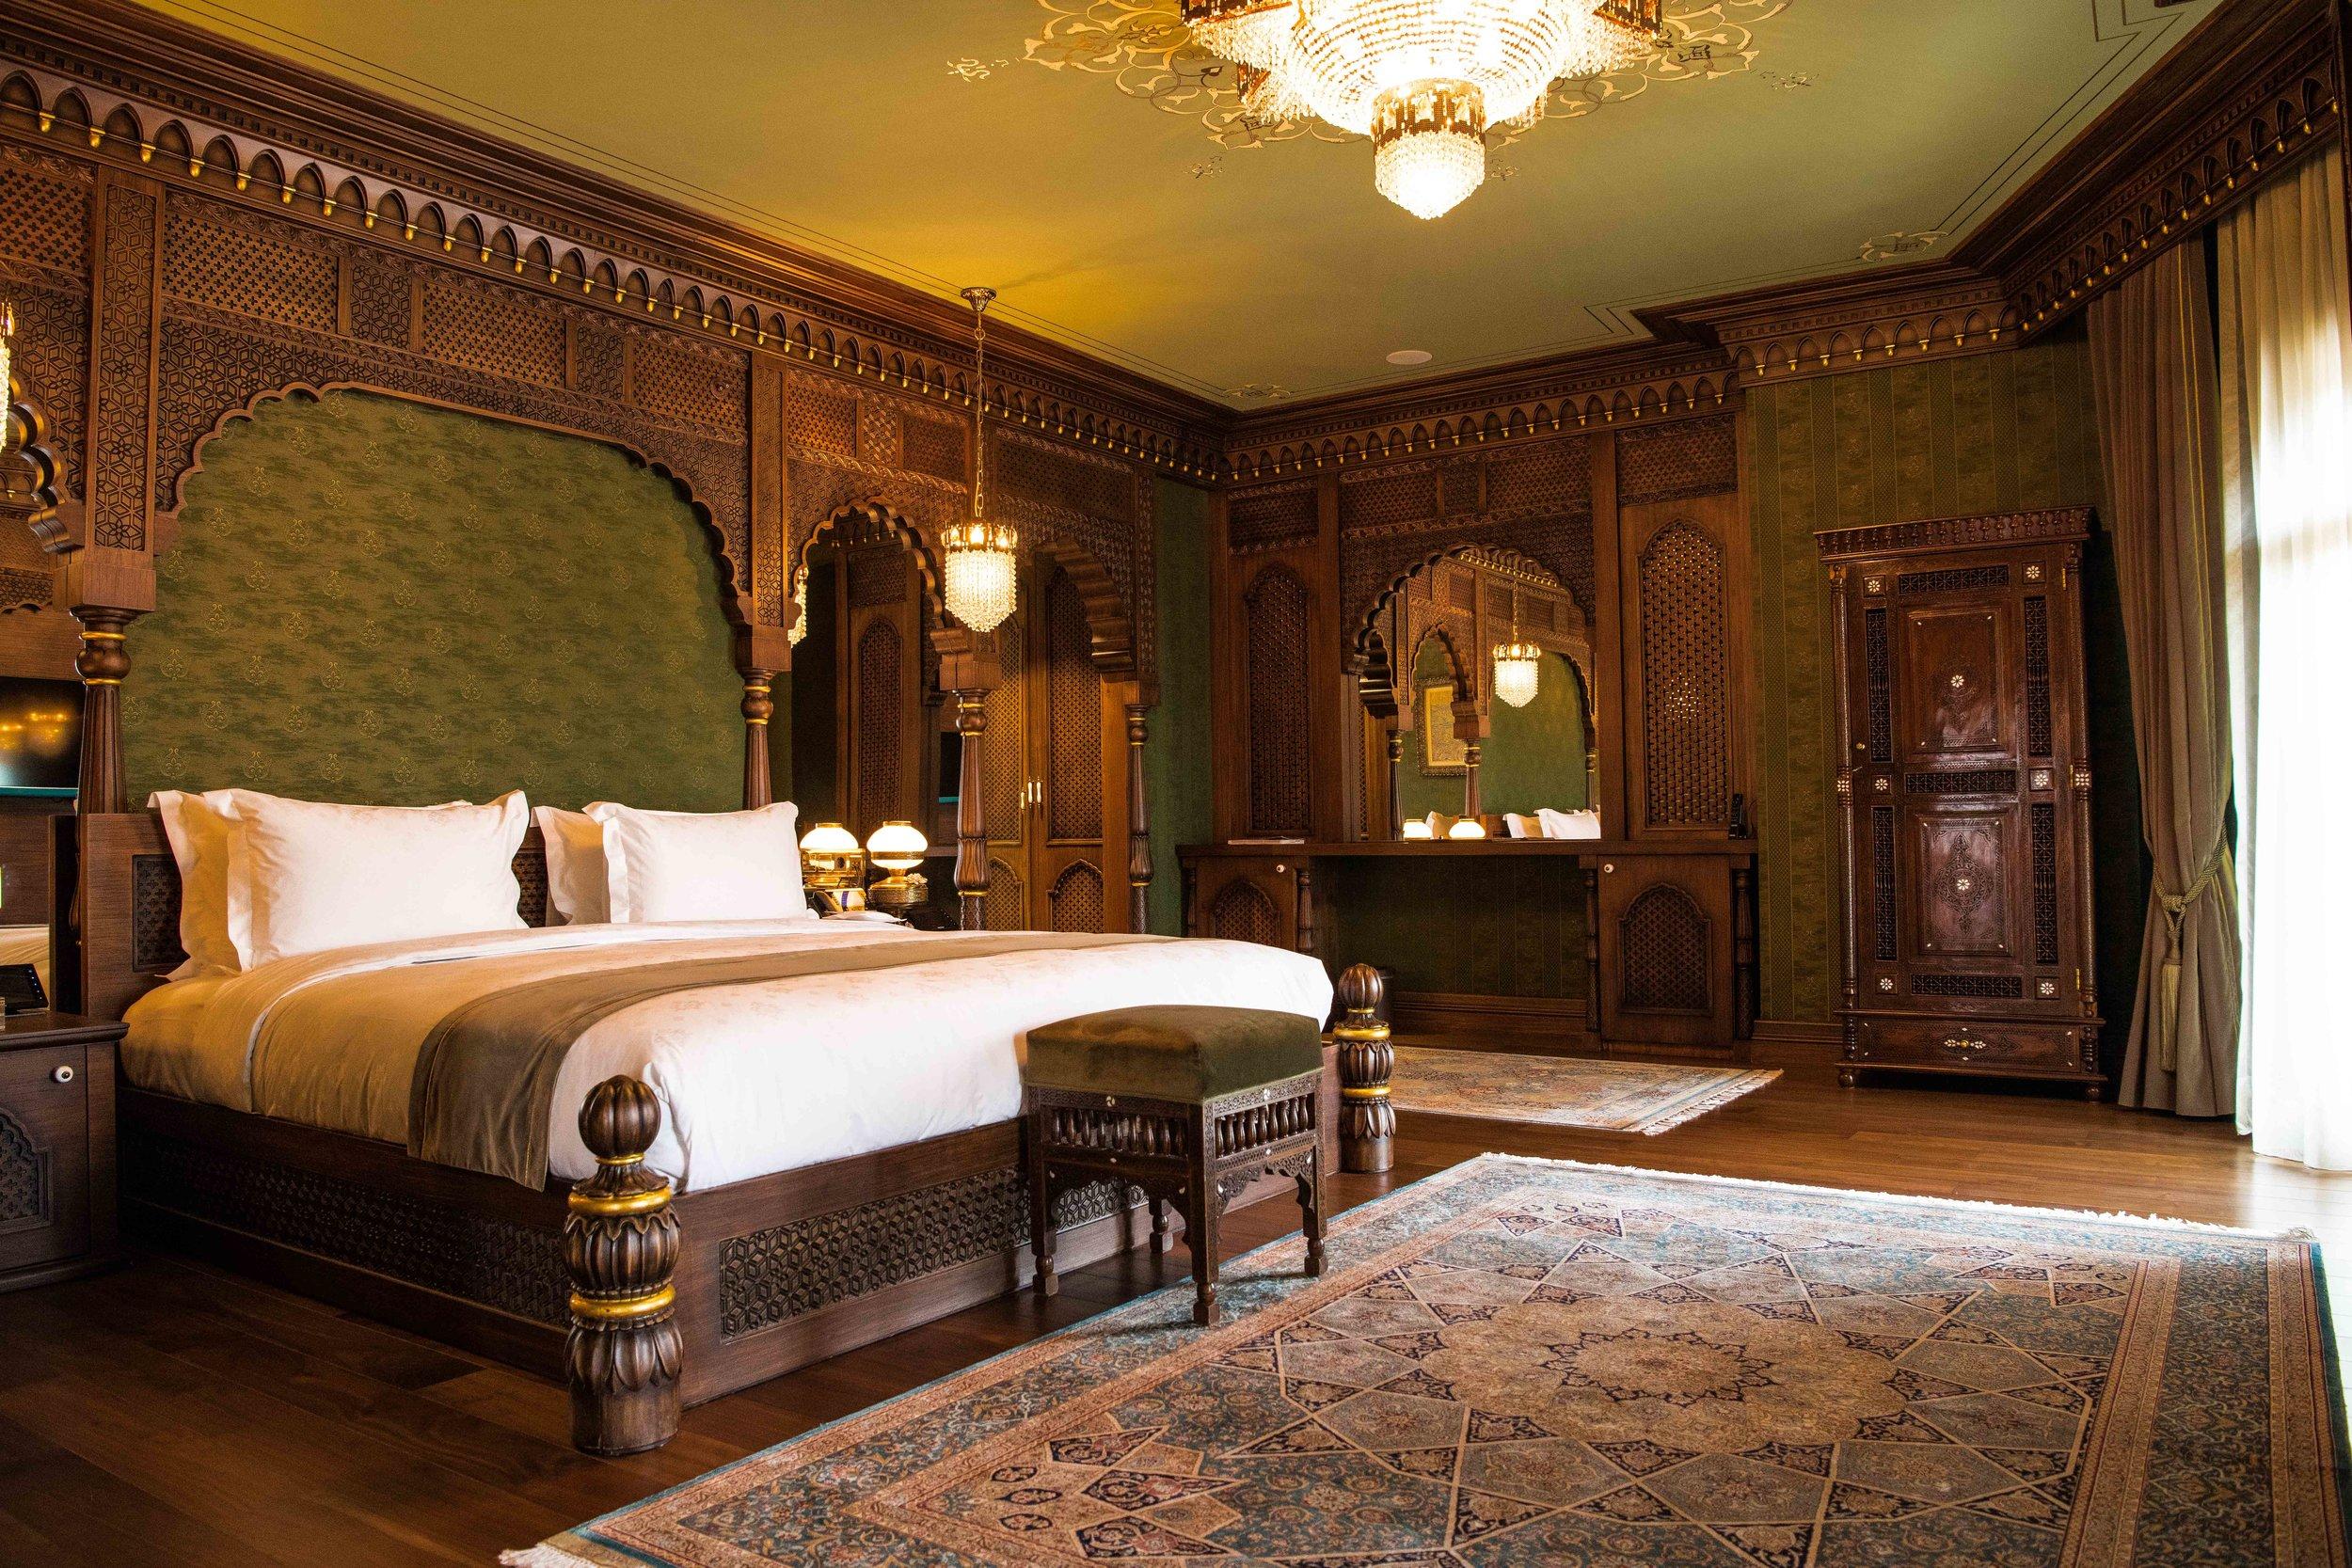 thetravelhub_istanbul_ajwa hotel-1298.jpg